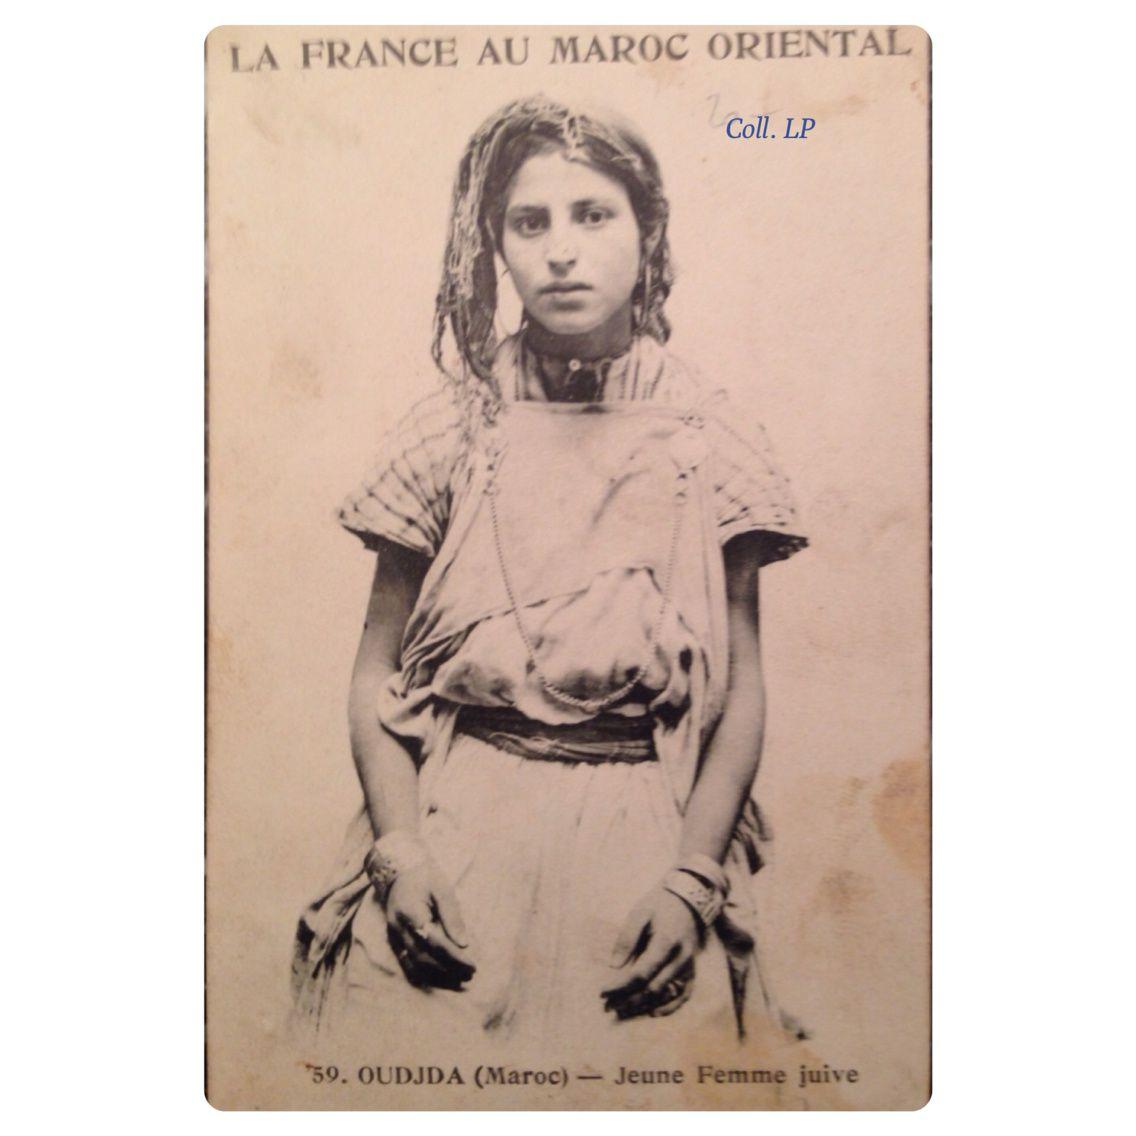 11 portraits de femmes Juives de Oudjda au Maroc